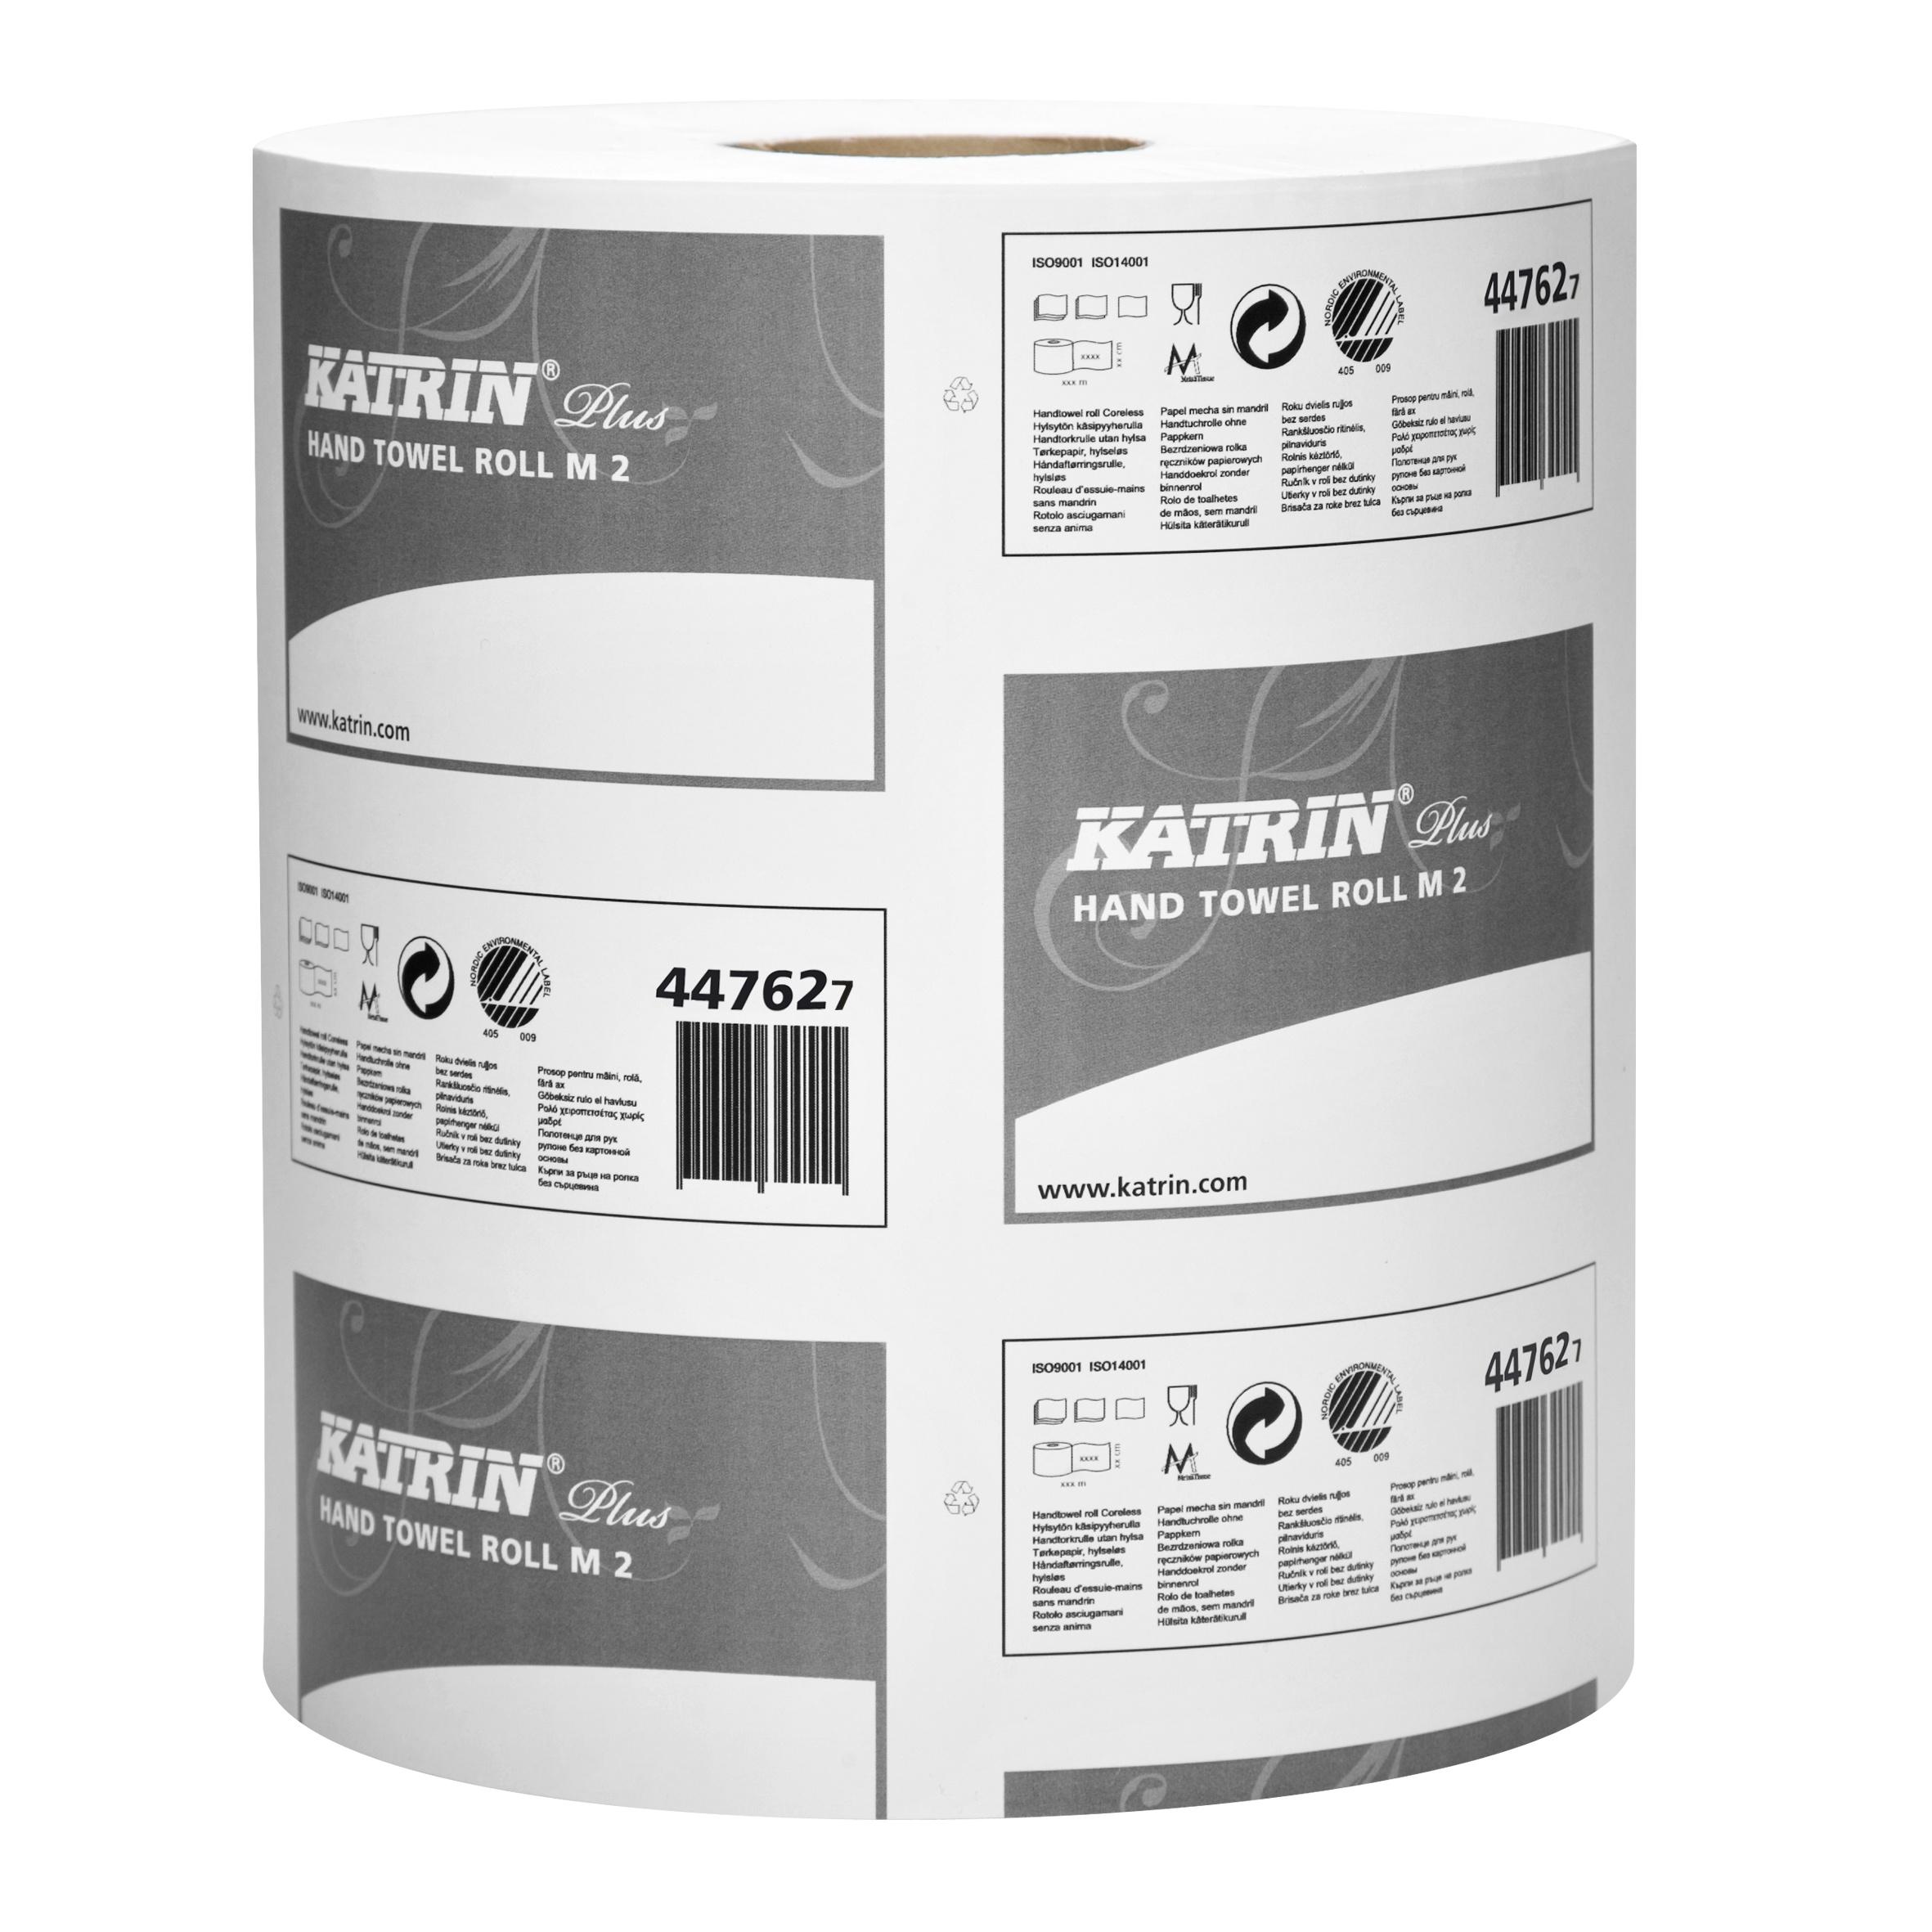 Ręcznik Katrin Plus M 2 447627